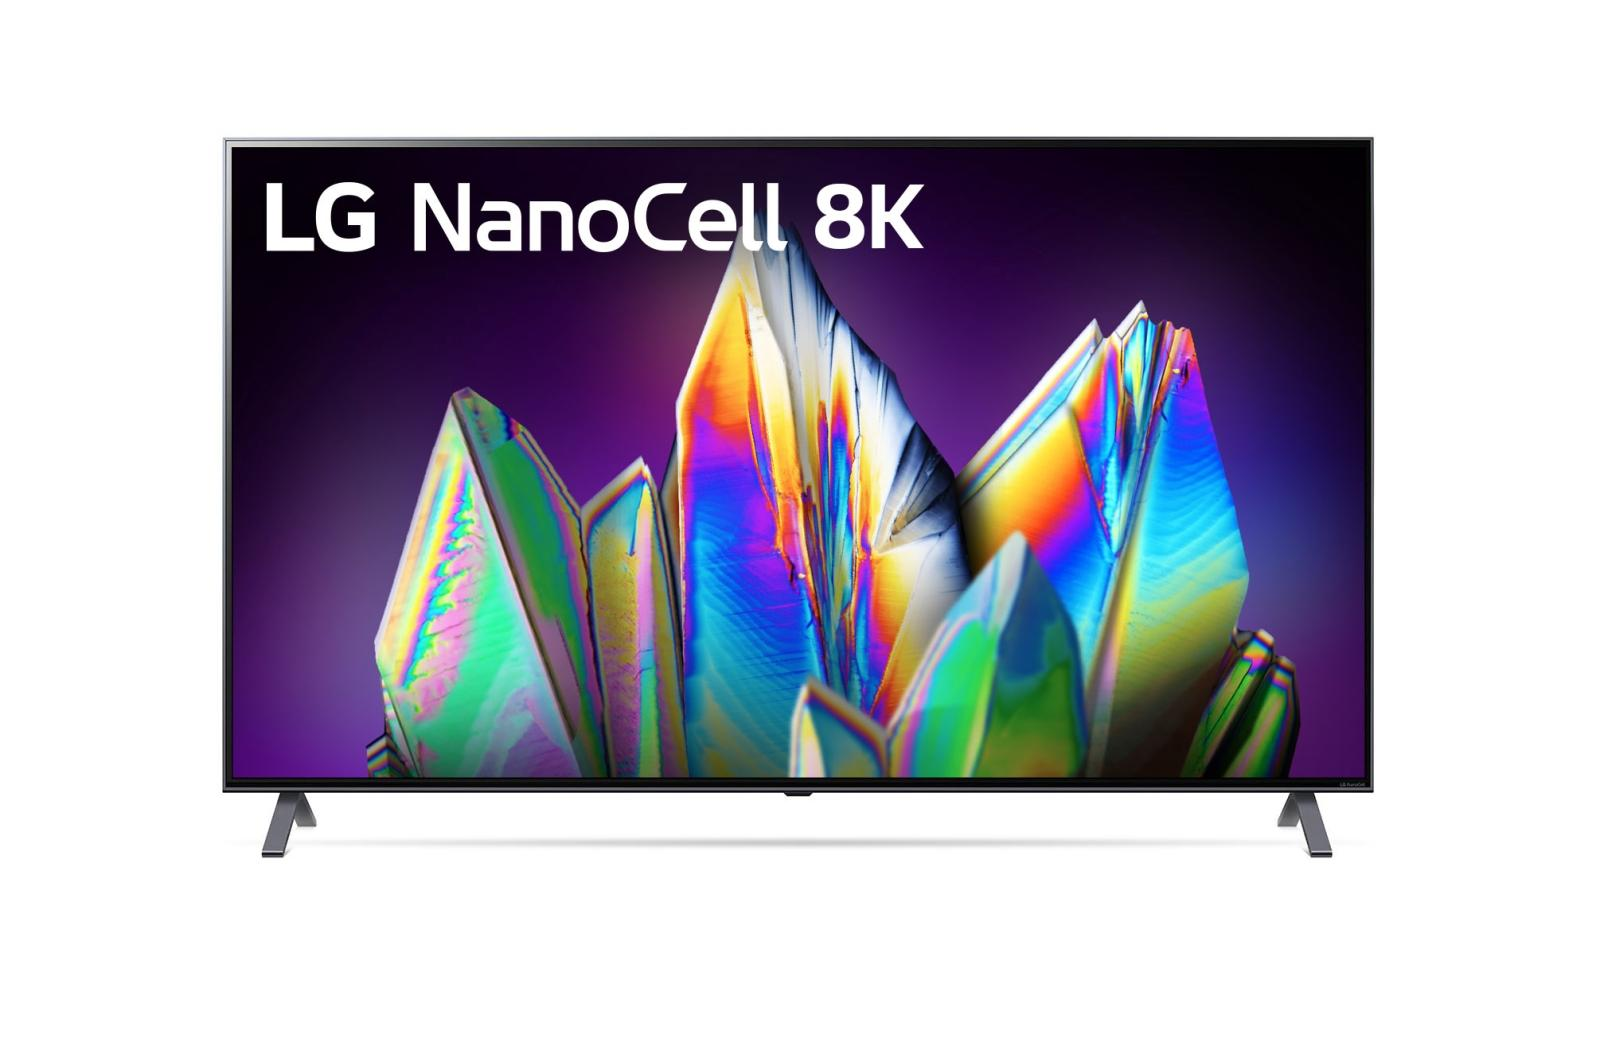 5 TV NanoCell 8K Έξυπνος Επεξεργαστής α9 3ης γενιάς Full Array Dimming Pro main image